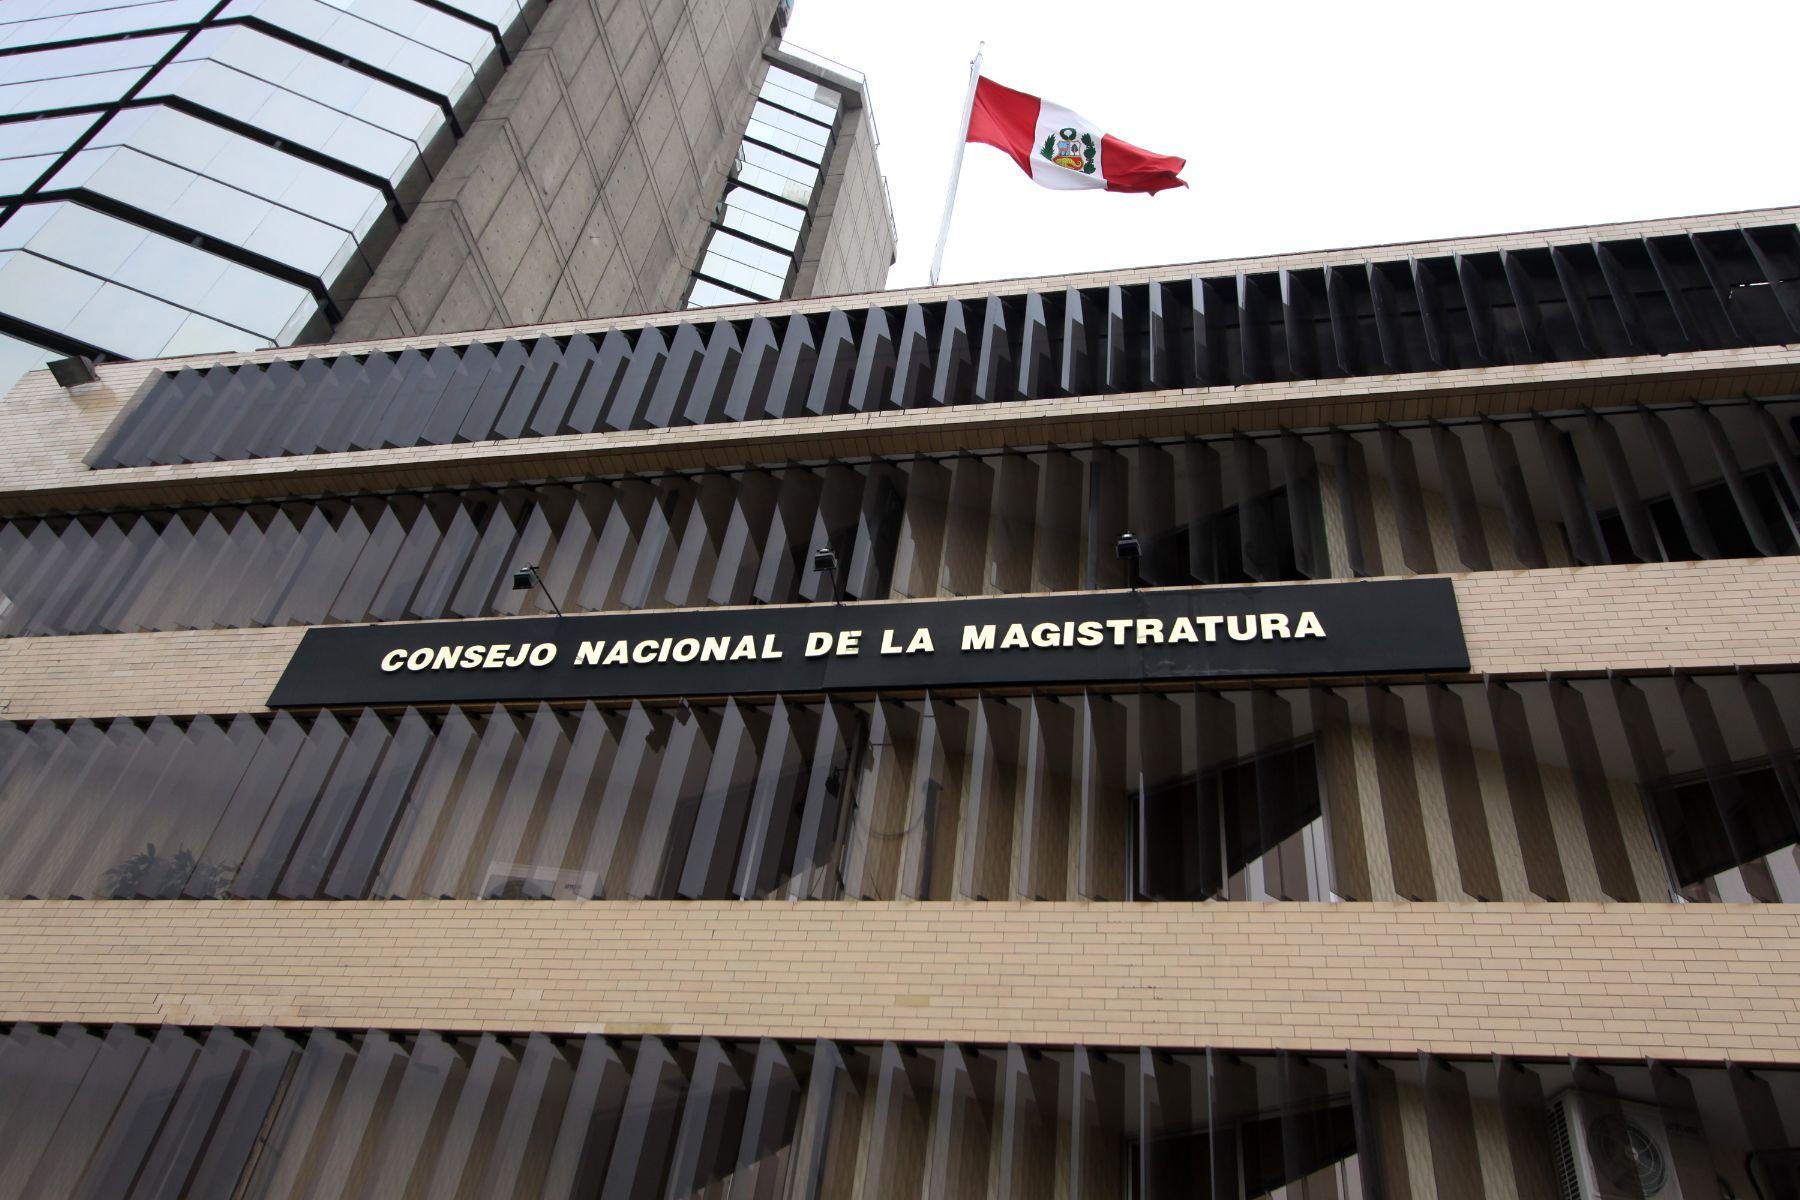 El Consejo Nacional de la Magistratura (CNM)